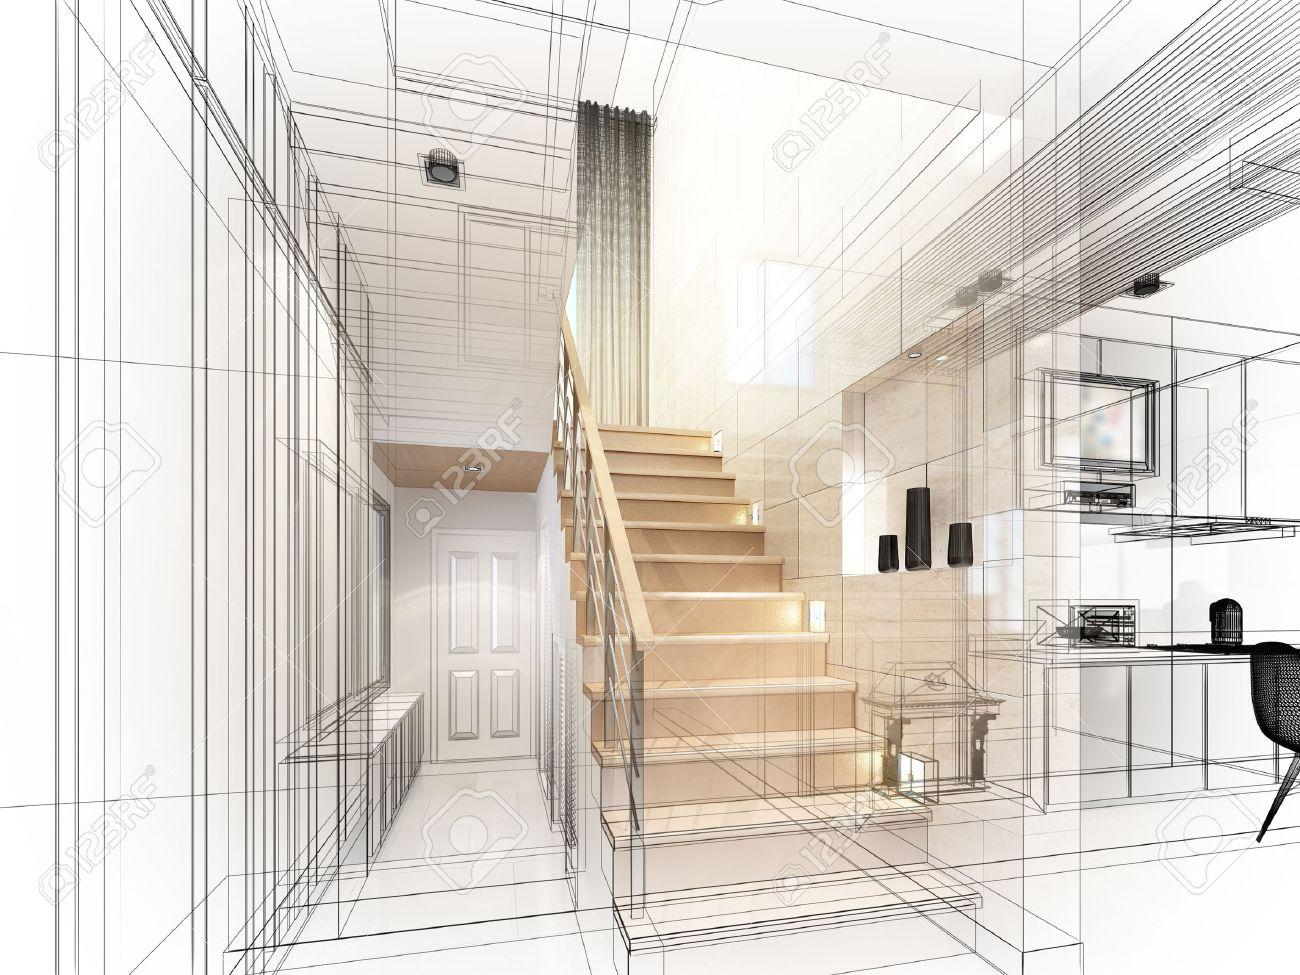 sketch design of stair hall 3dwire frame render - 40904846